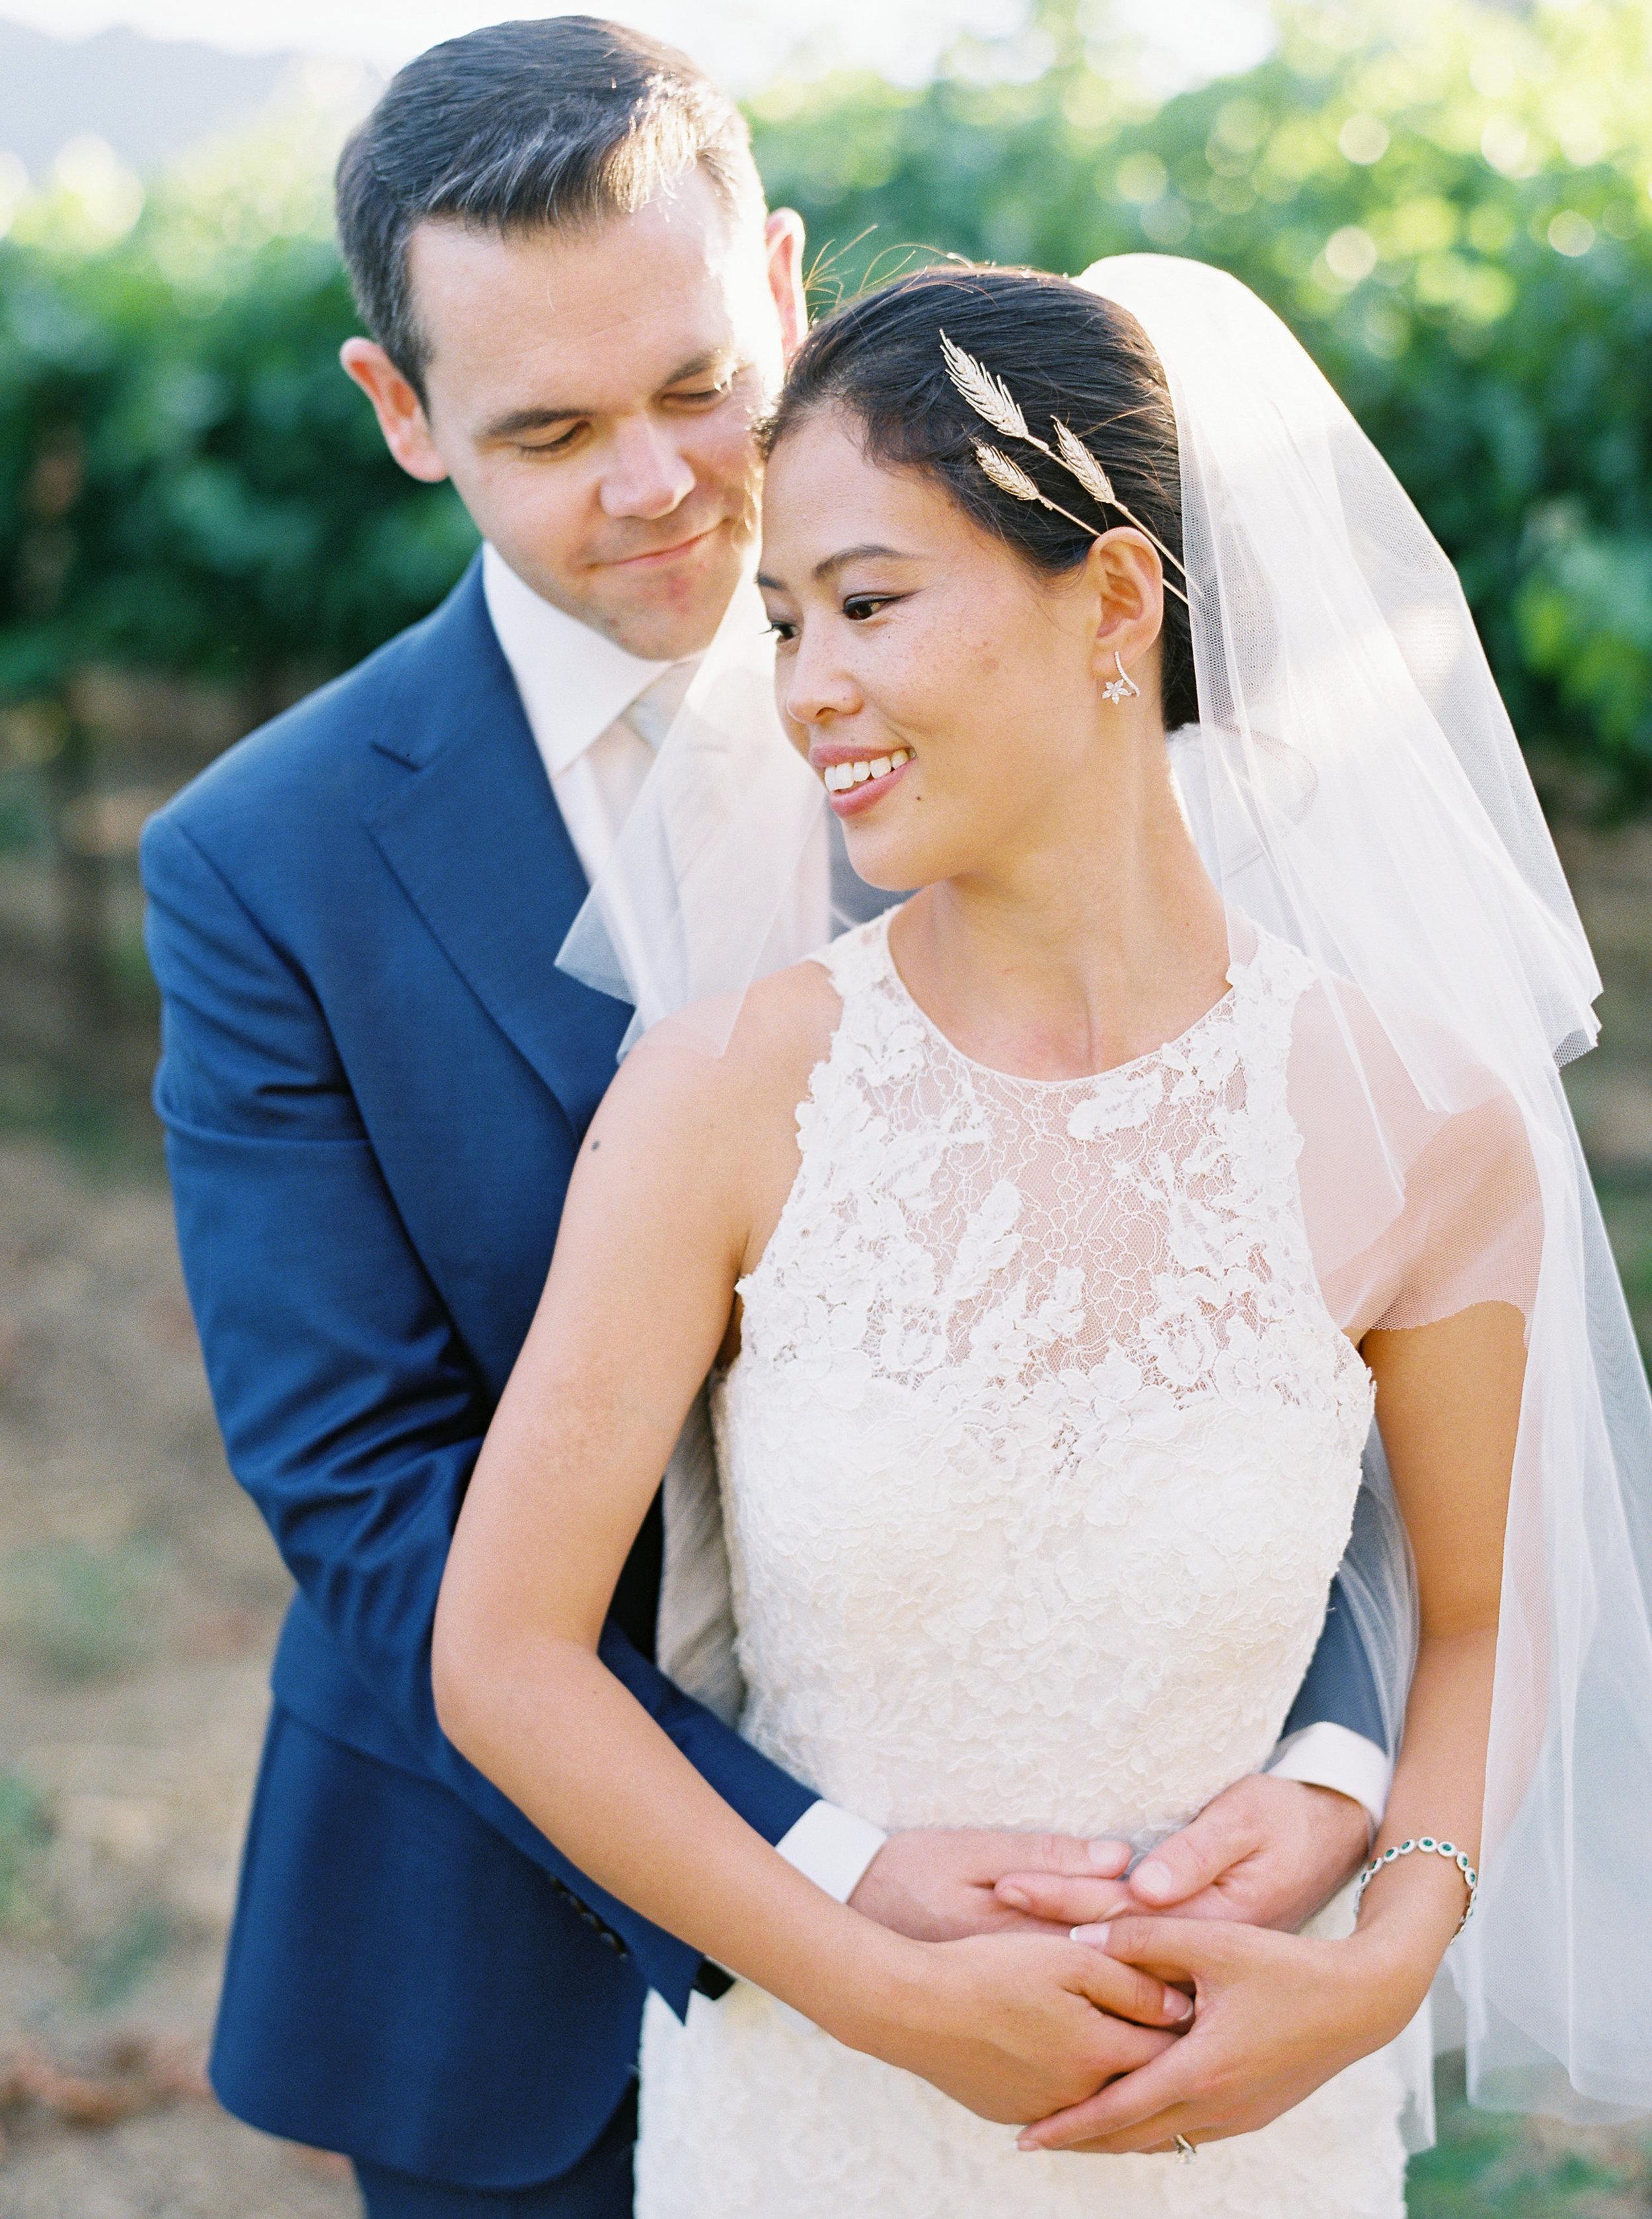 Harvest-inn-wedding-in-napa-california-20.jpg